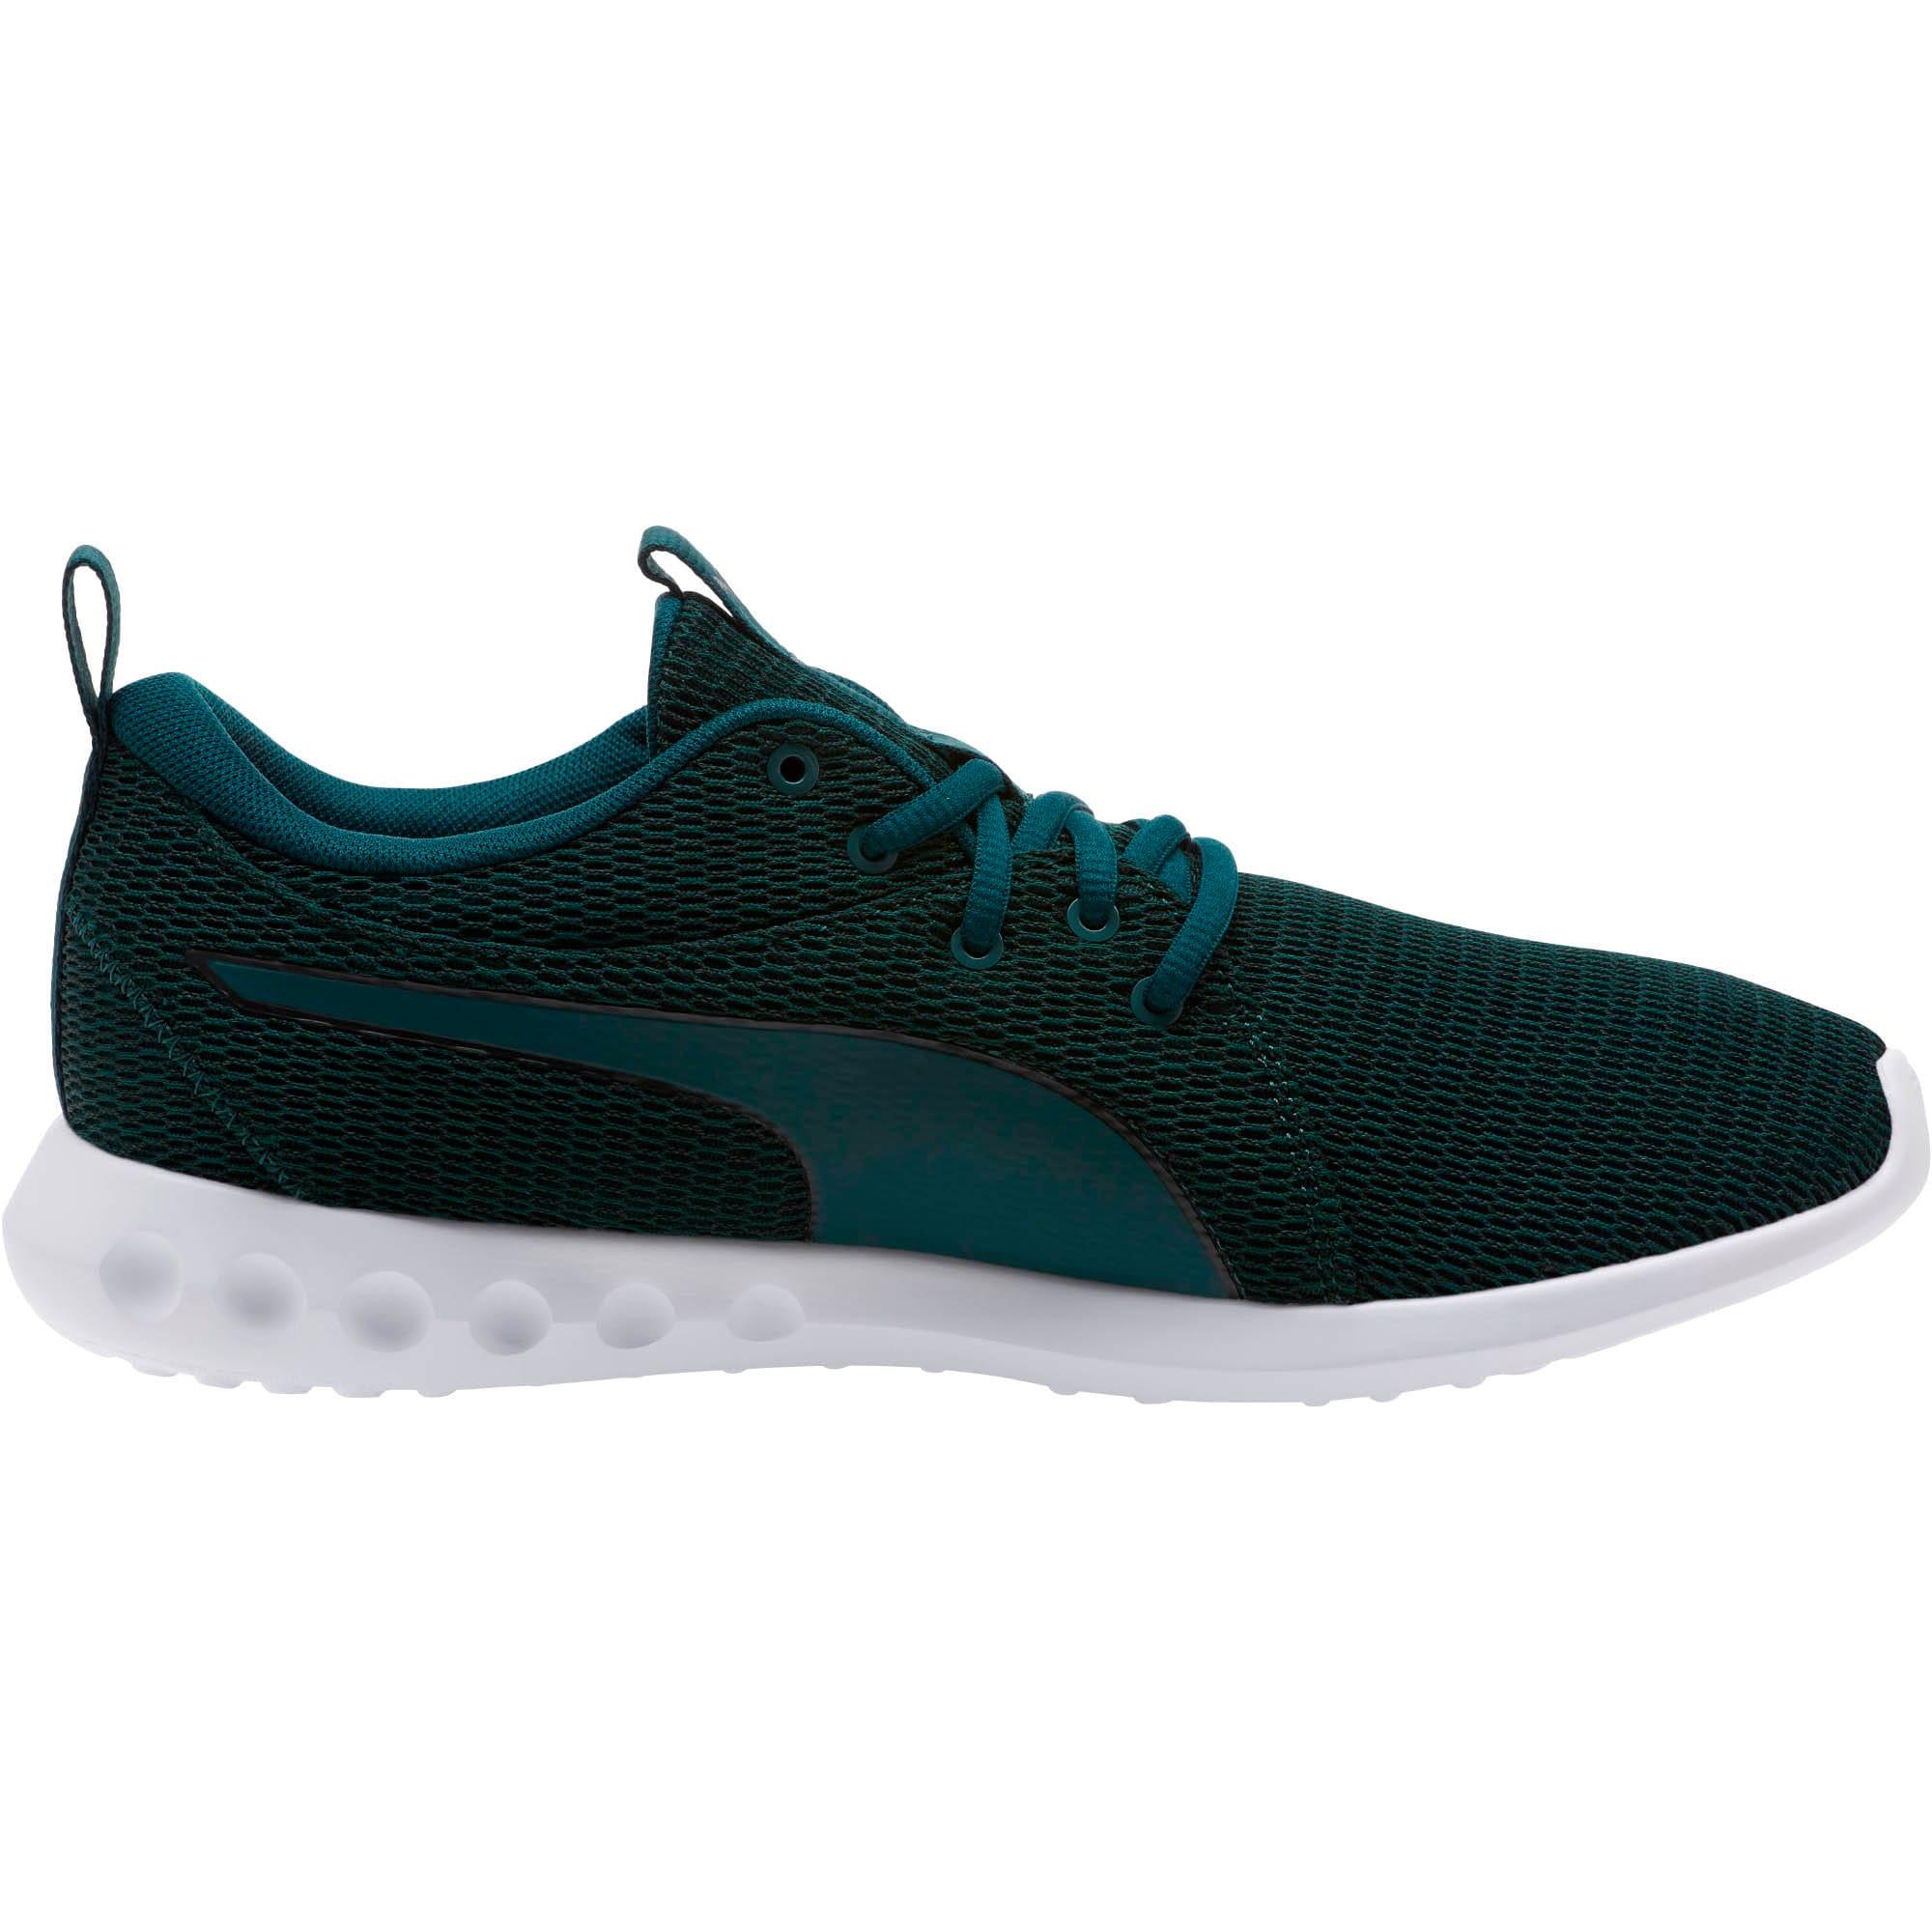 Miniatura 3 de Zapatos para correrCarson 2 New Corepara hombre, Ponderosa Pine-Puma White, mediano